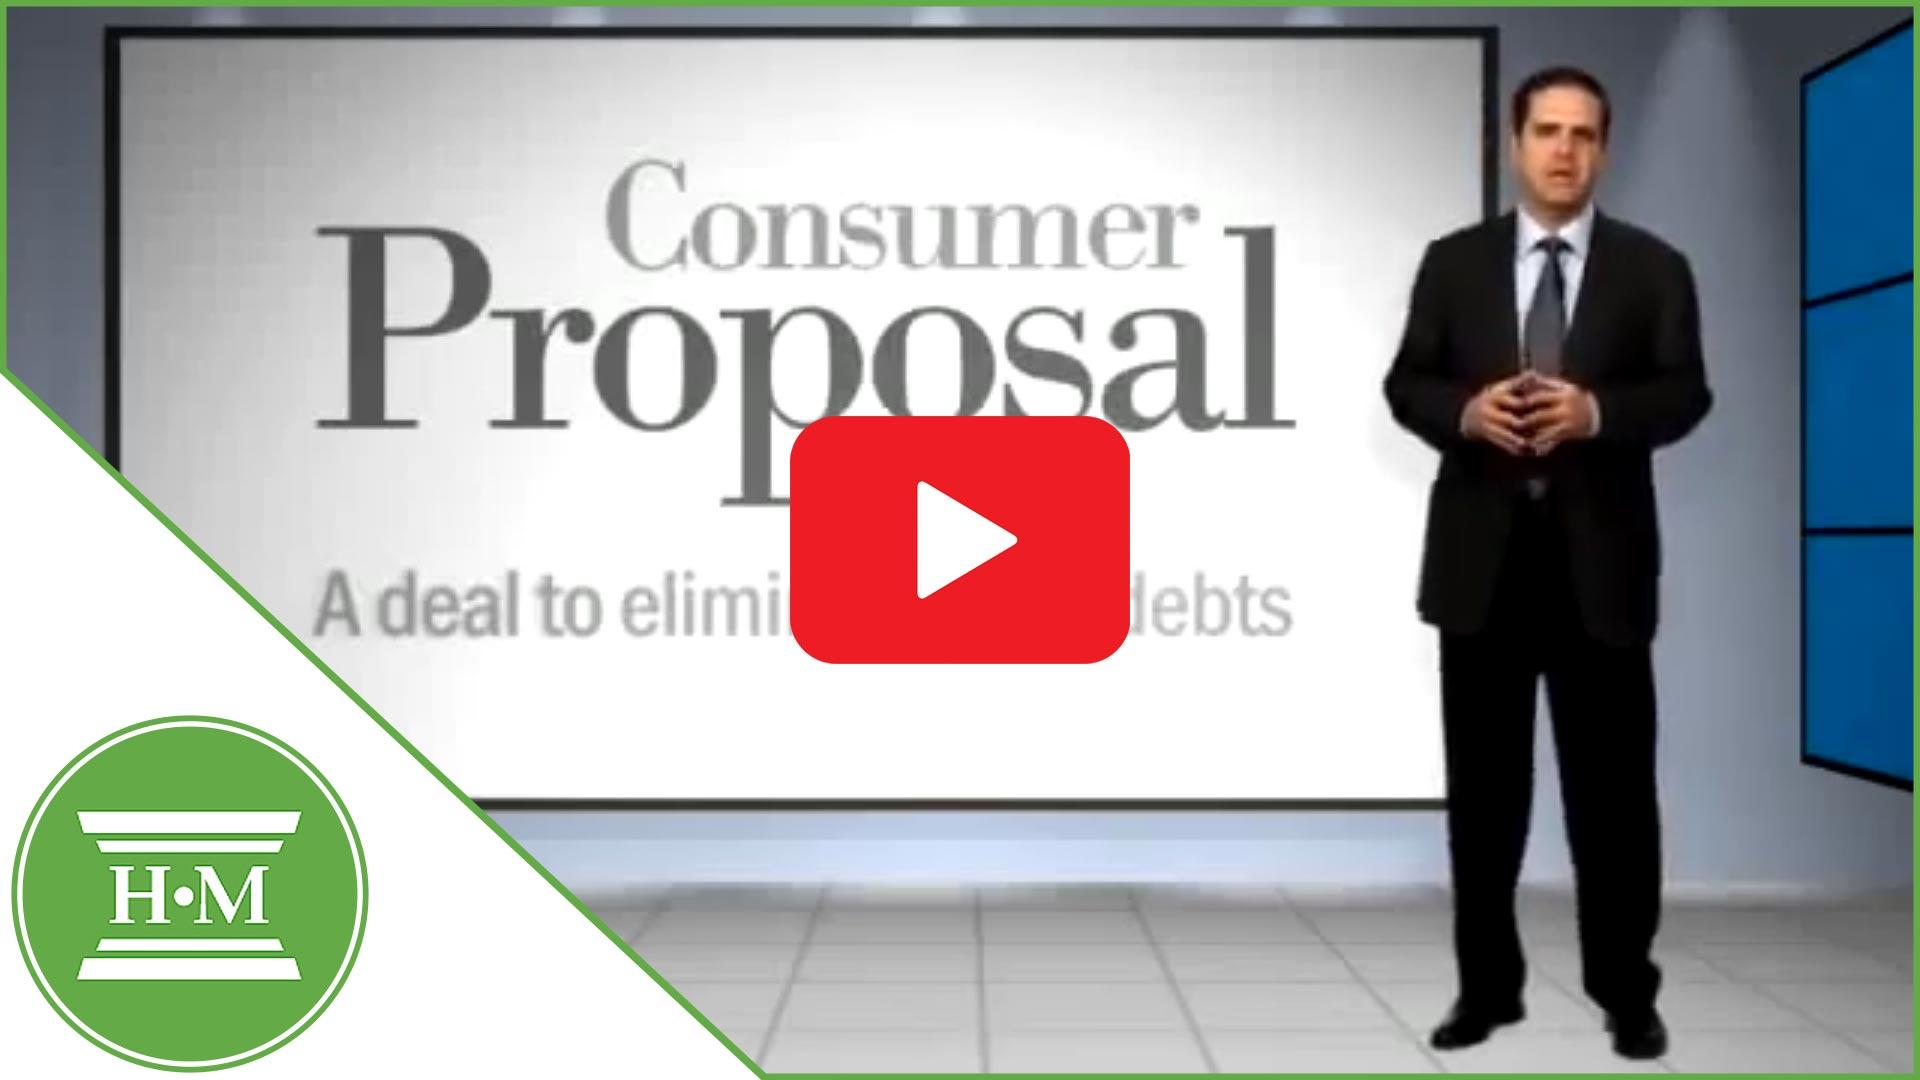 consumer proposal Canada - a deal to eliminate debt